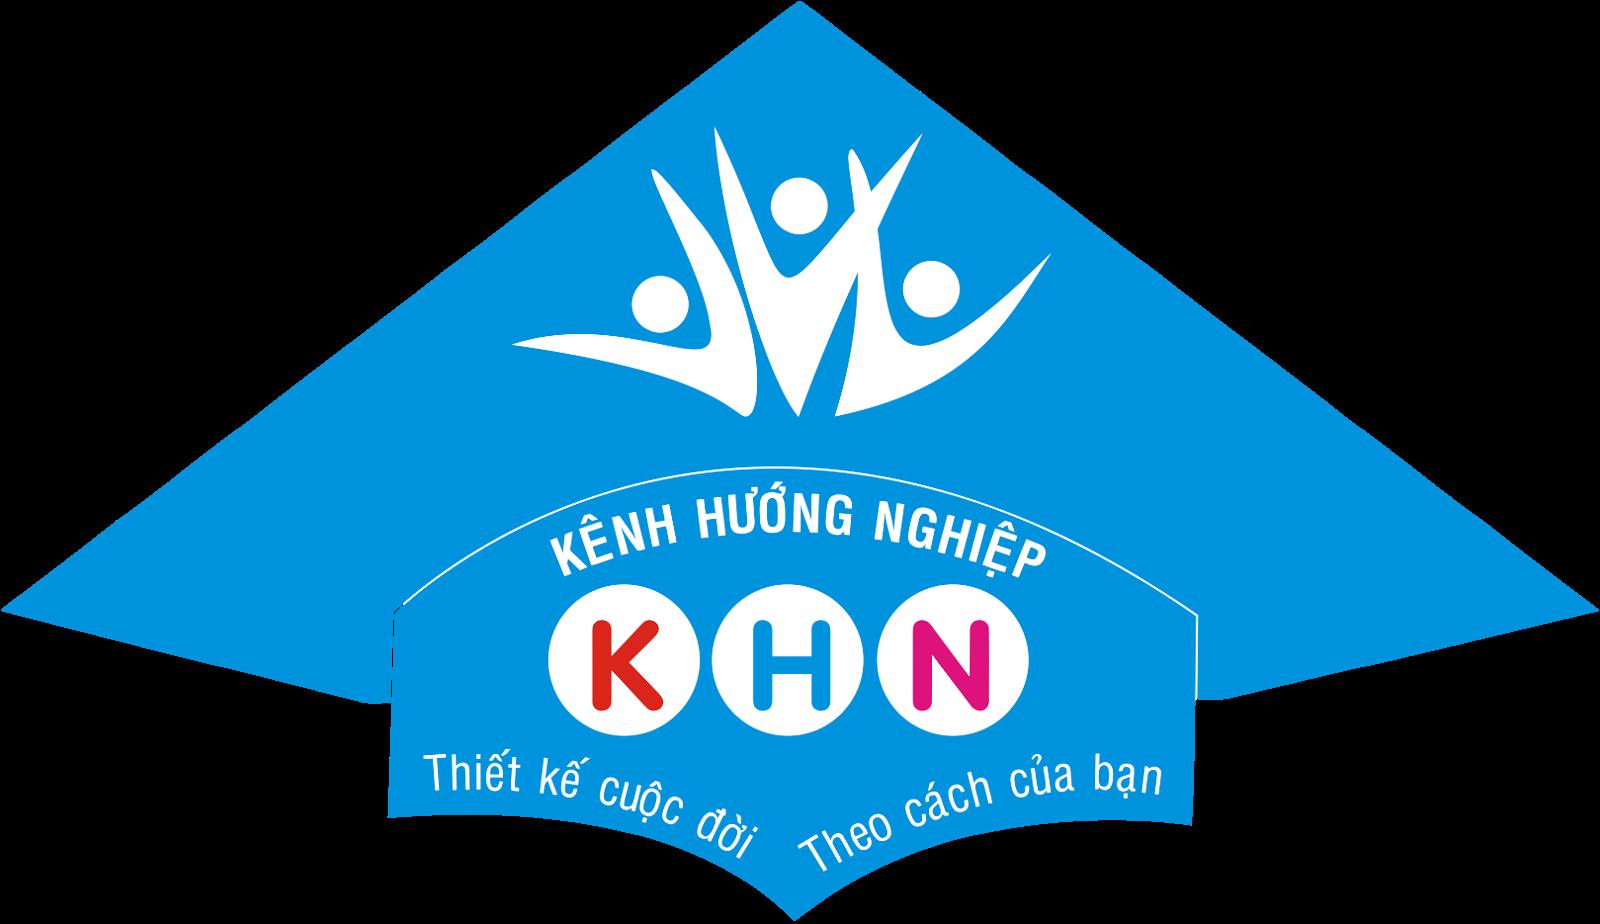 logo-kenh-huong-nghiep